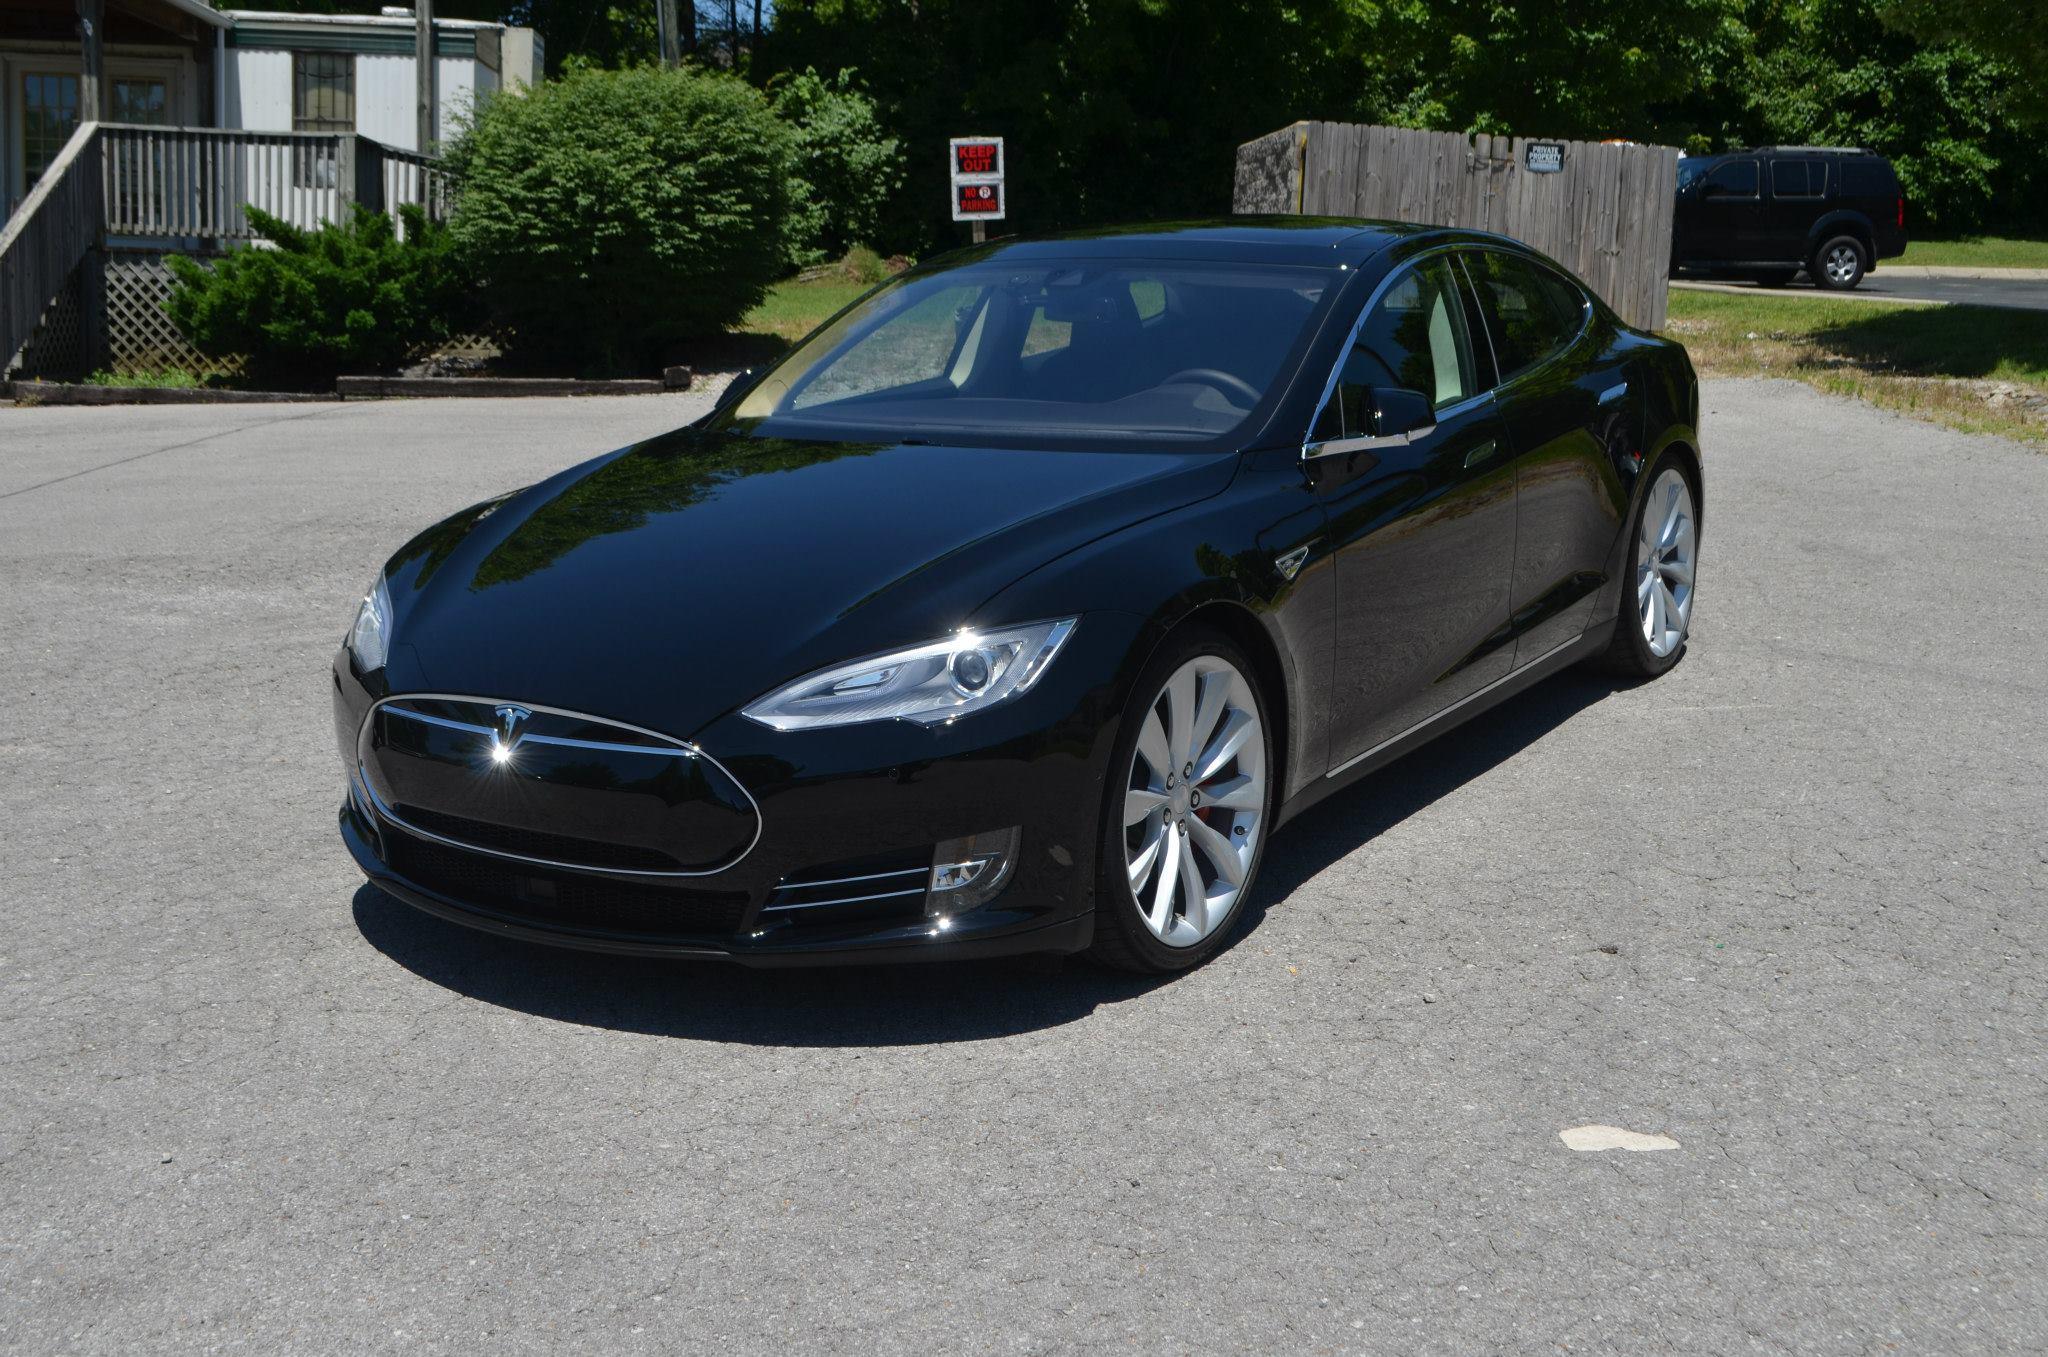 Tesla P85D: Track Pack PPF, CQ FINEST Professional